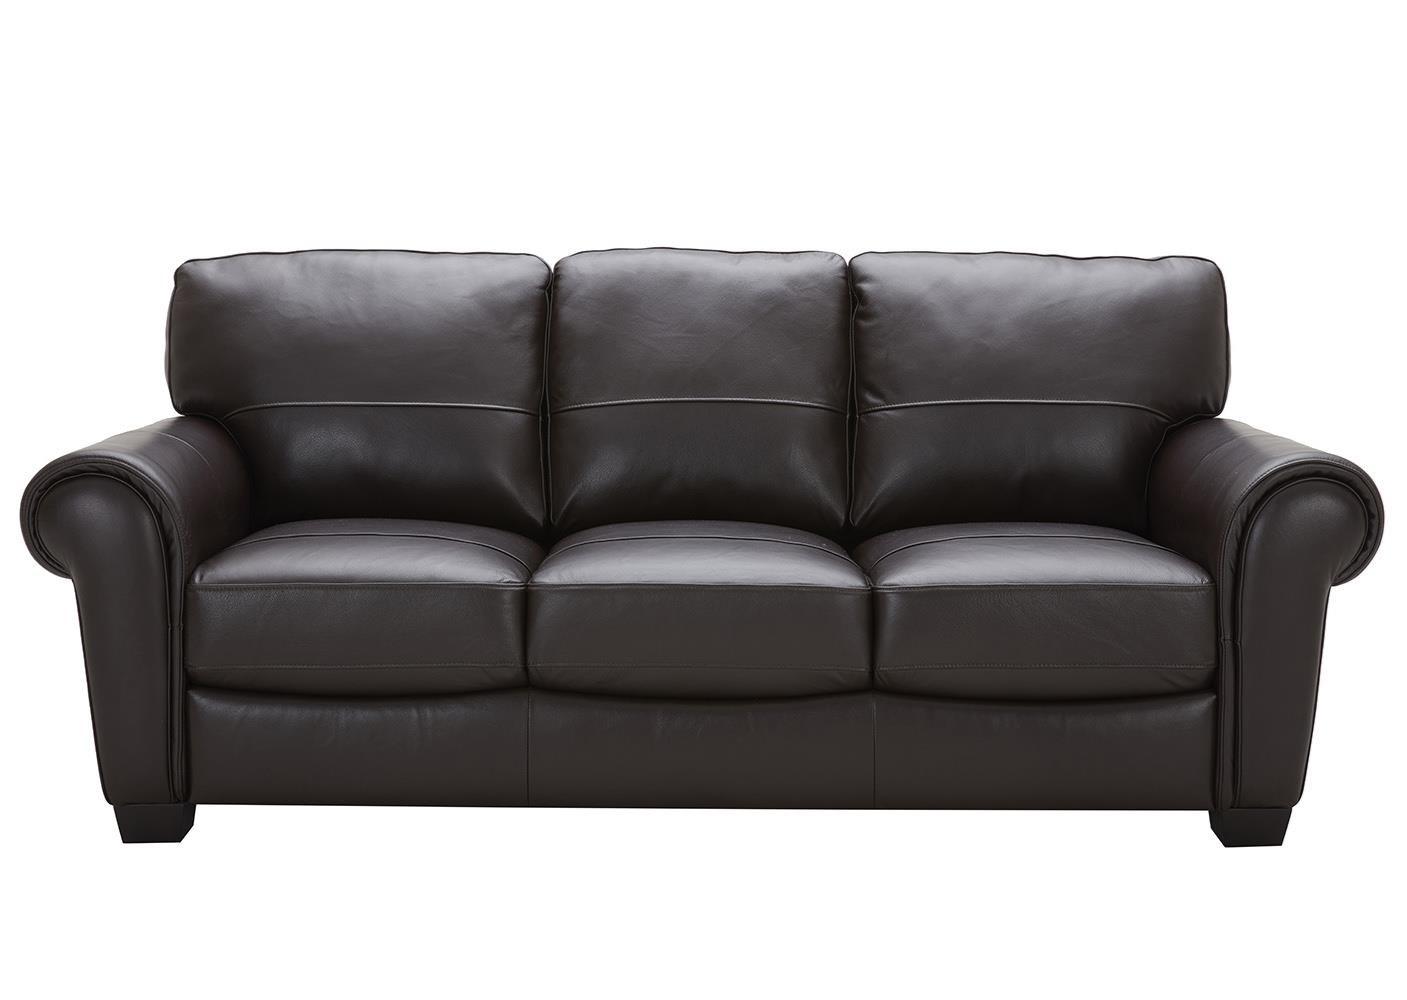 baby sofa chair malaysia pillows for cream leather teddy urban evolution belfort